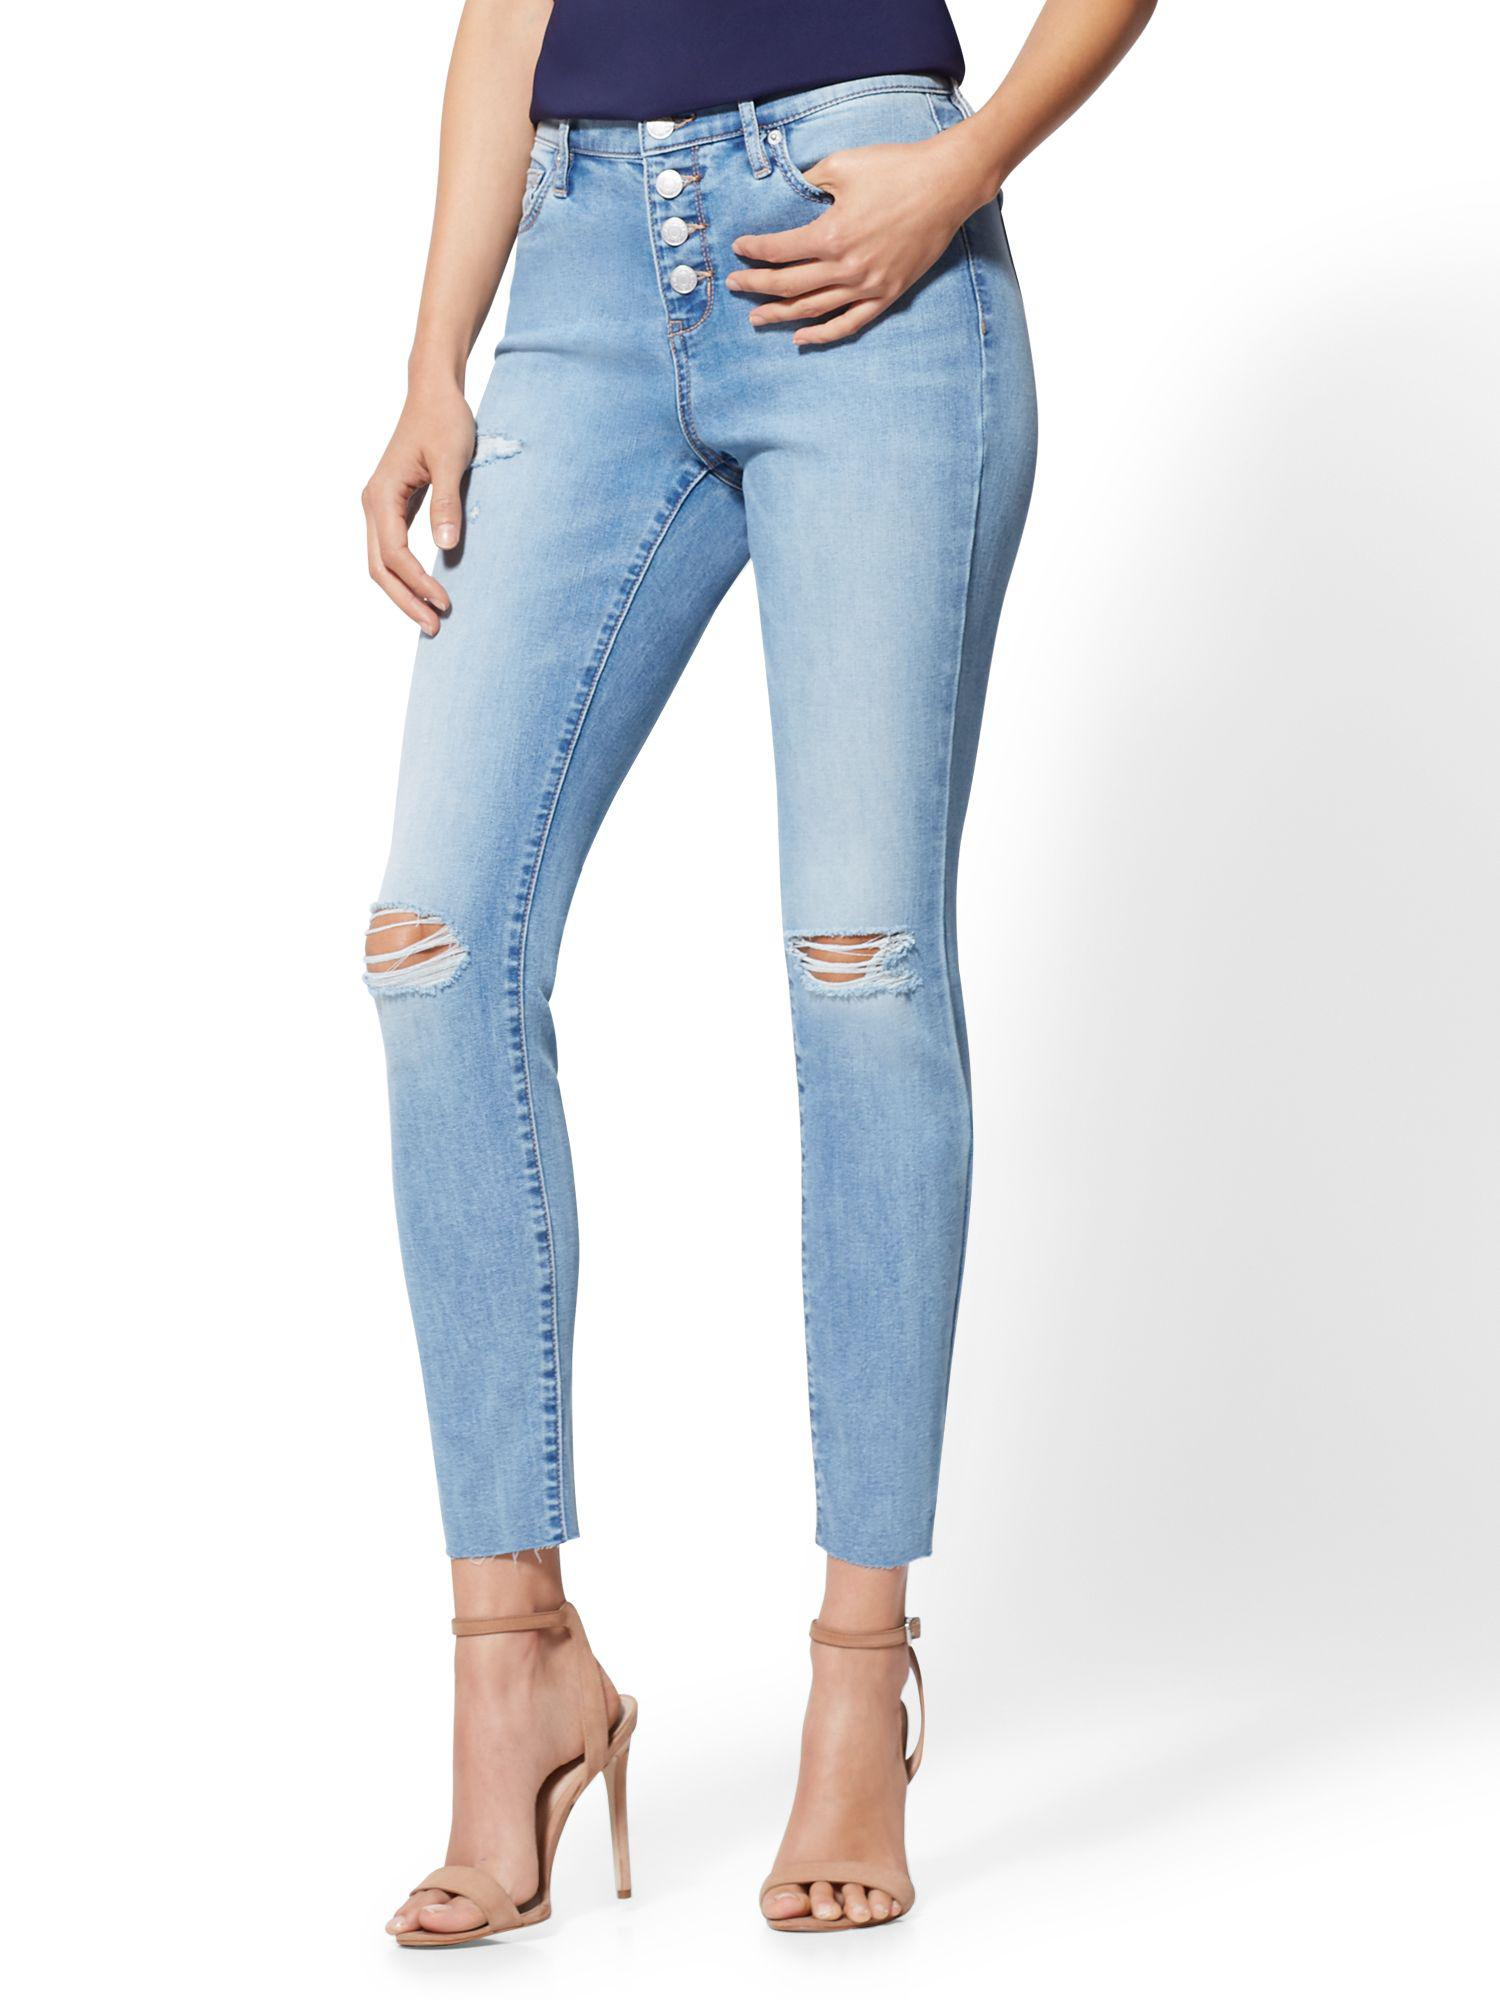 947460b58de New York   Company. Women s Blue Soho Jeans - Ny c Runway - High-waist  Ankle Legging